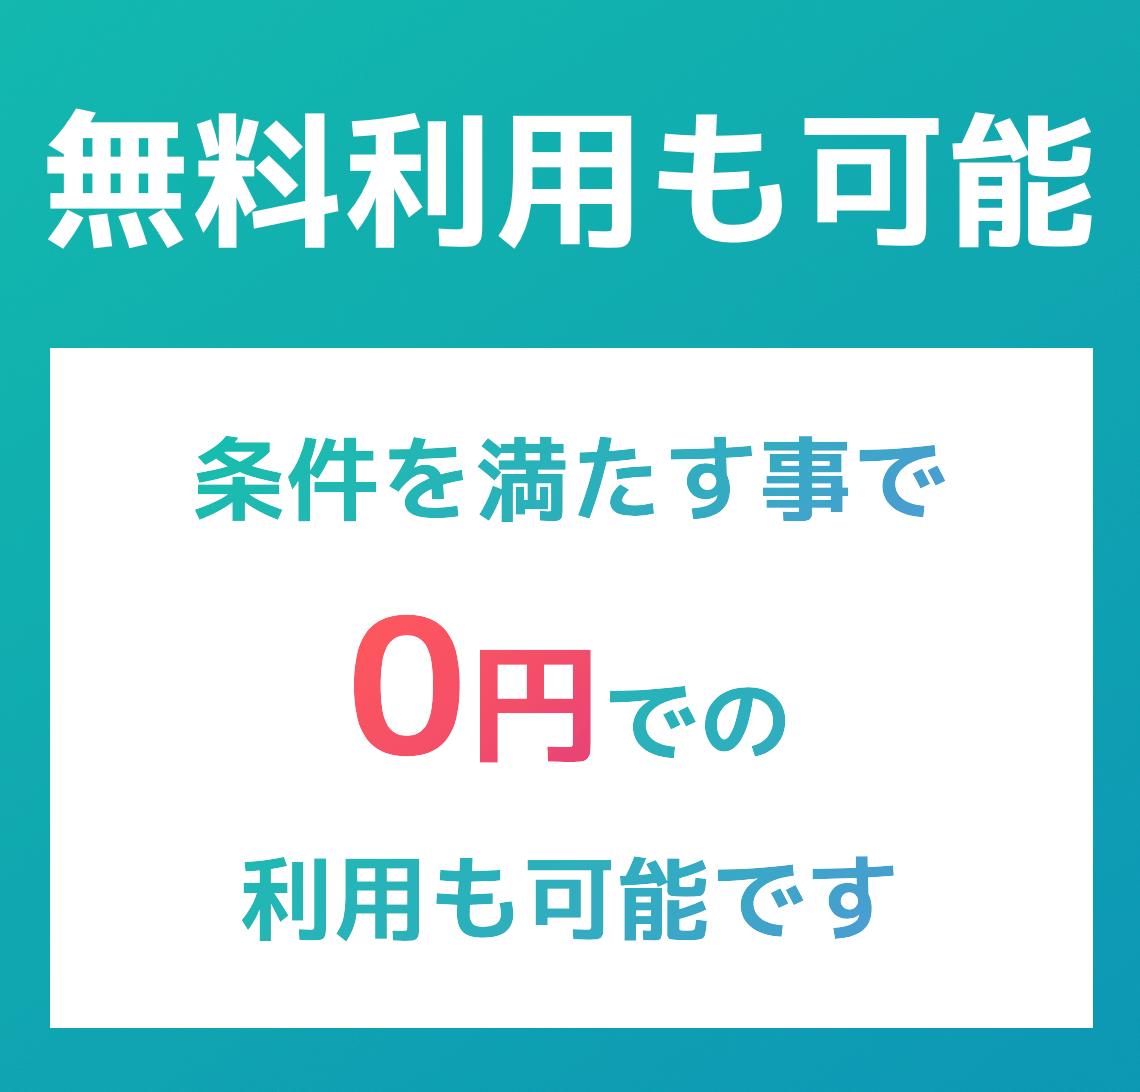 news-discount-19